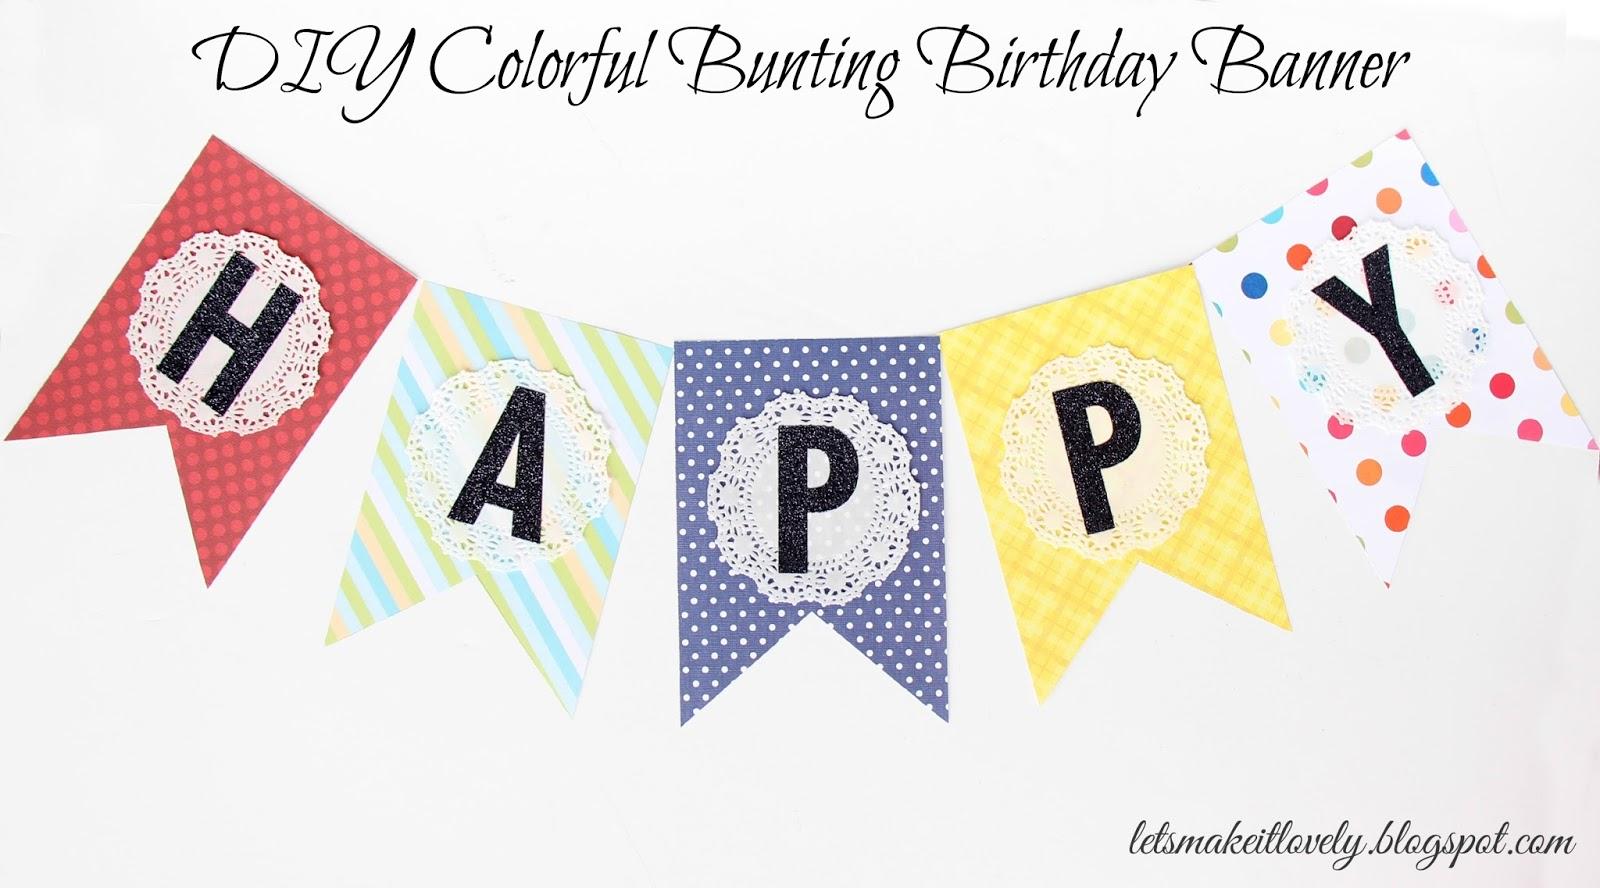 let 39 s make it lovely diy colorful bunting birthday banner. Black Bedroom Furniture Sets. Home Design Ideas